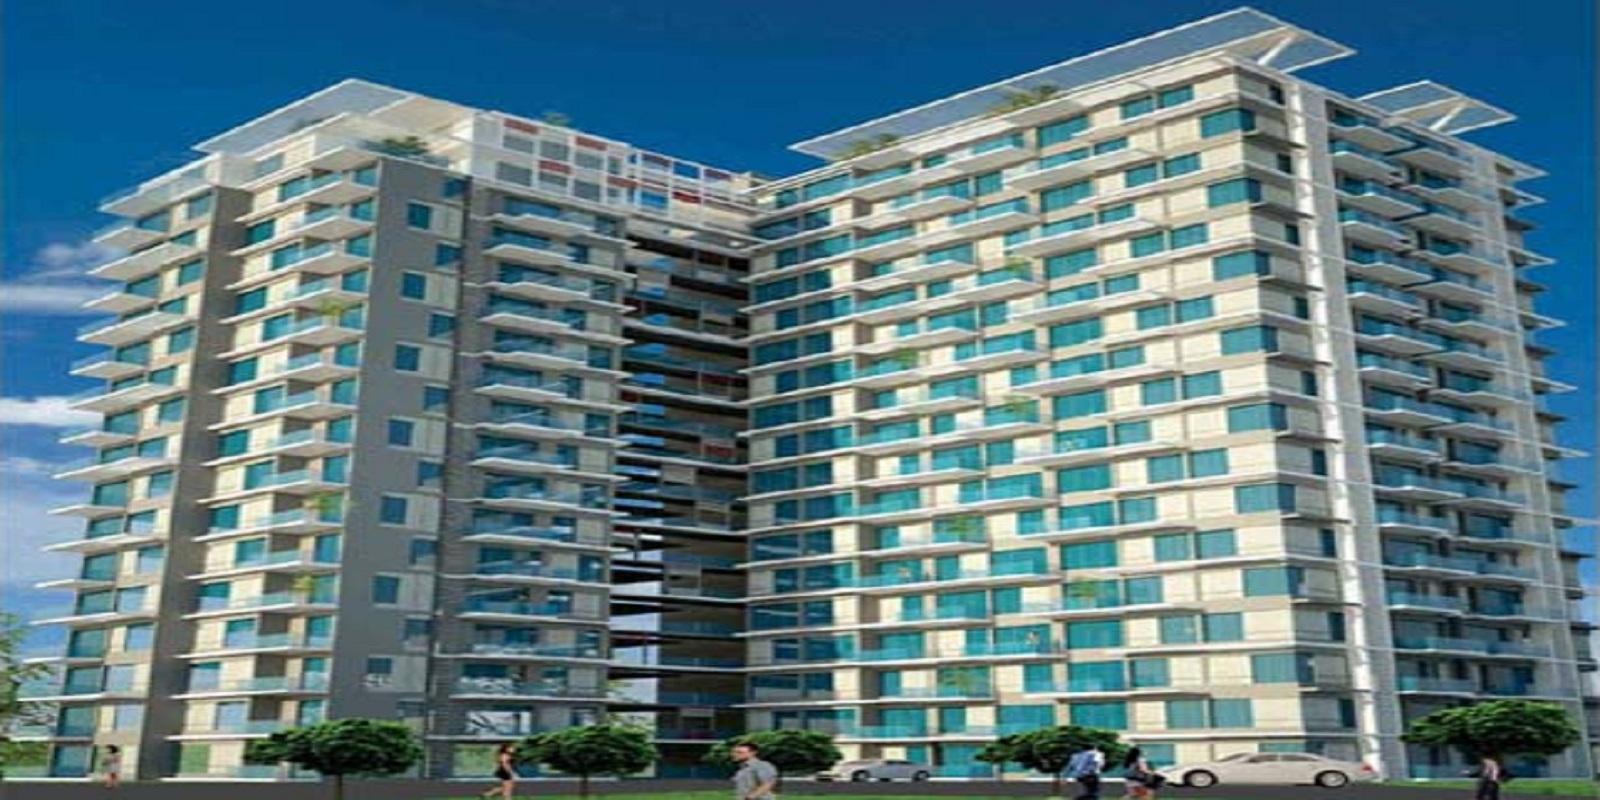 vdb azure project large image2